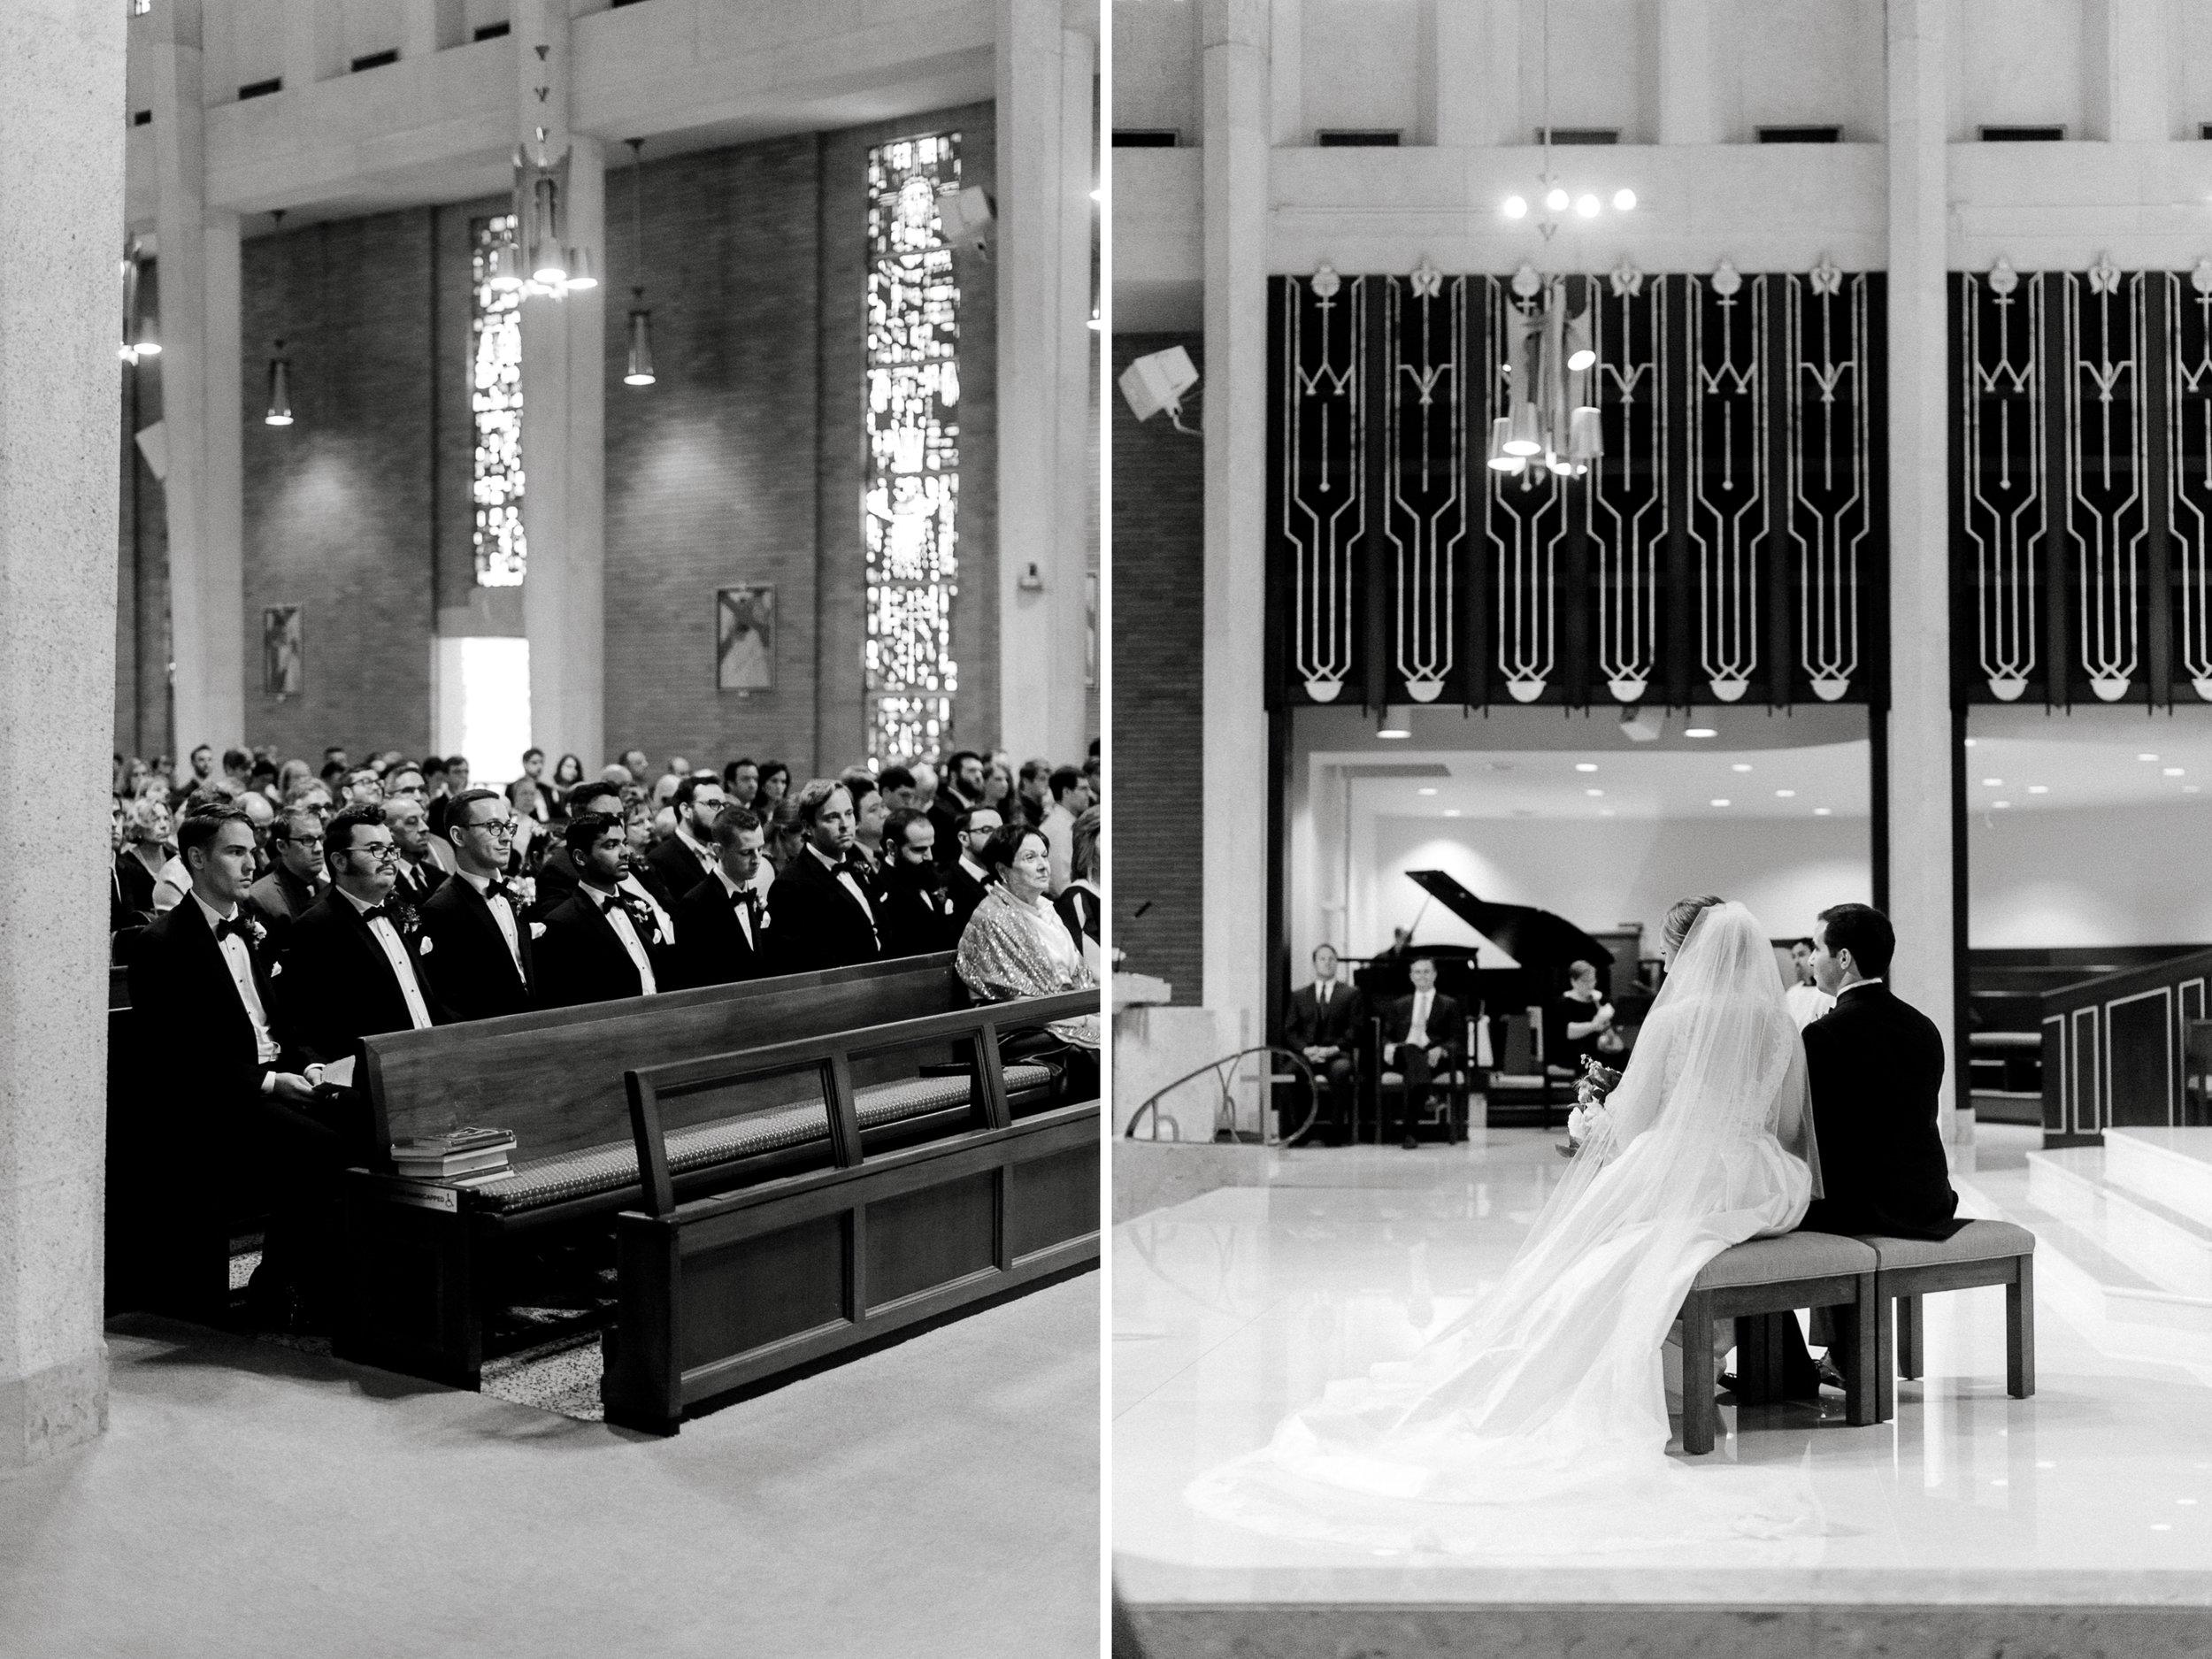 St-Michaels-Catholic-Church-Houston-Wedding-Ceremony-Josh-Dana-Fernandez-Photographer-Destination-Austin-Dallas-Fine-Art-Film-103.jpg